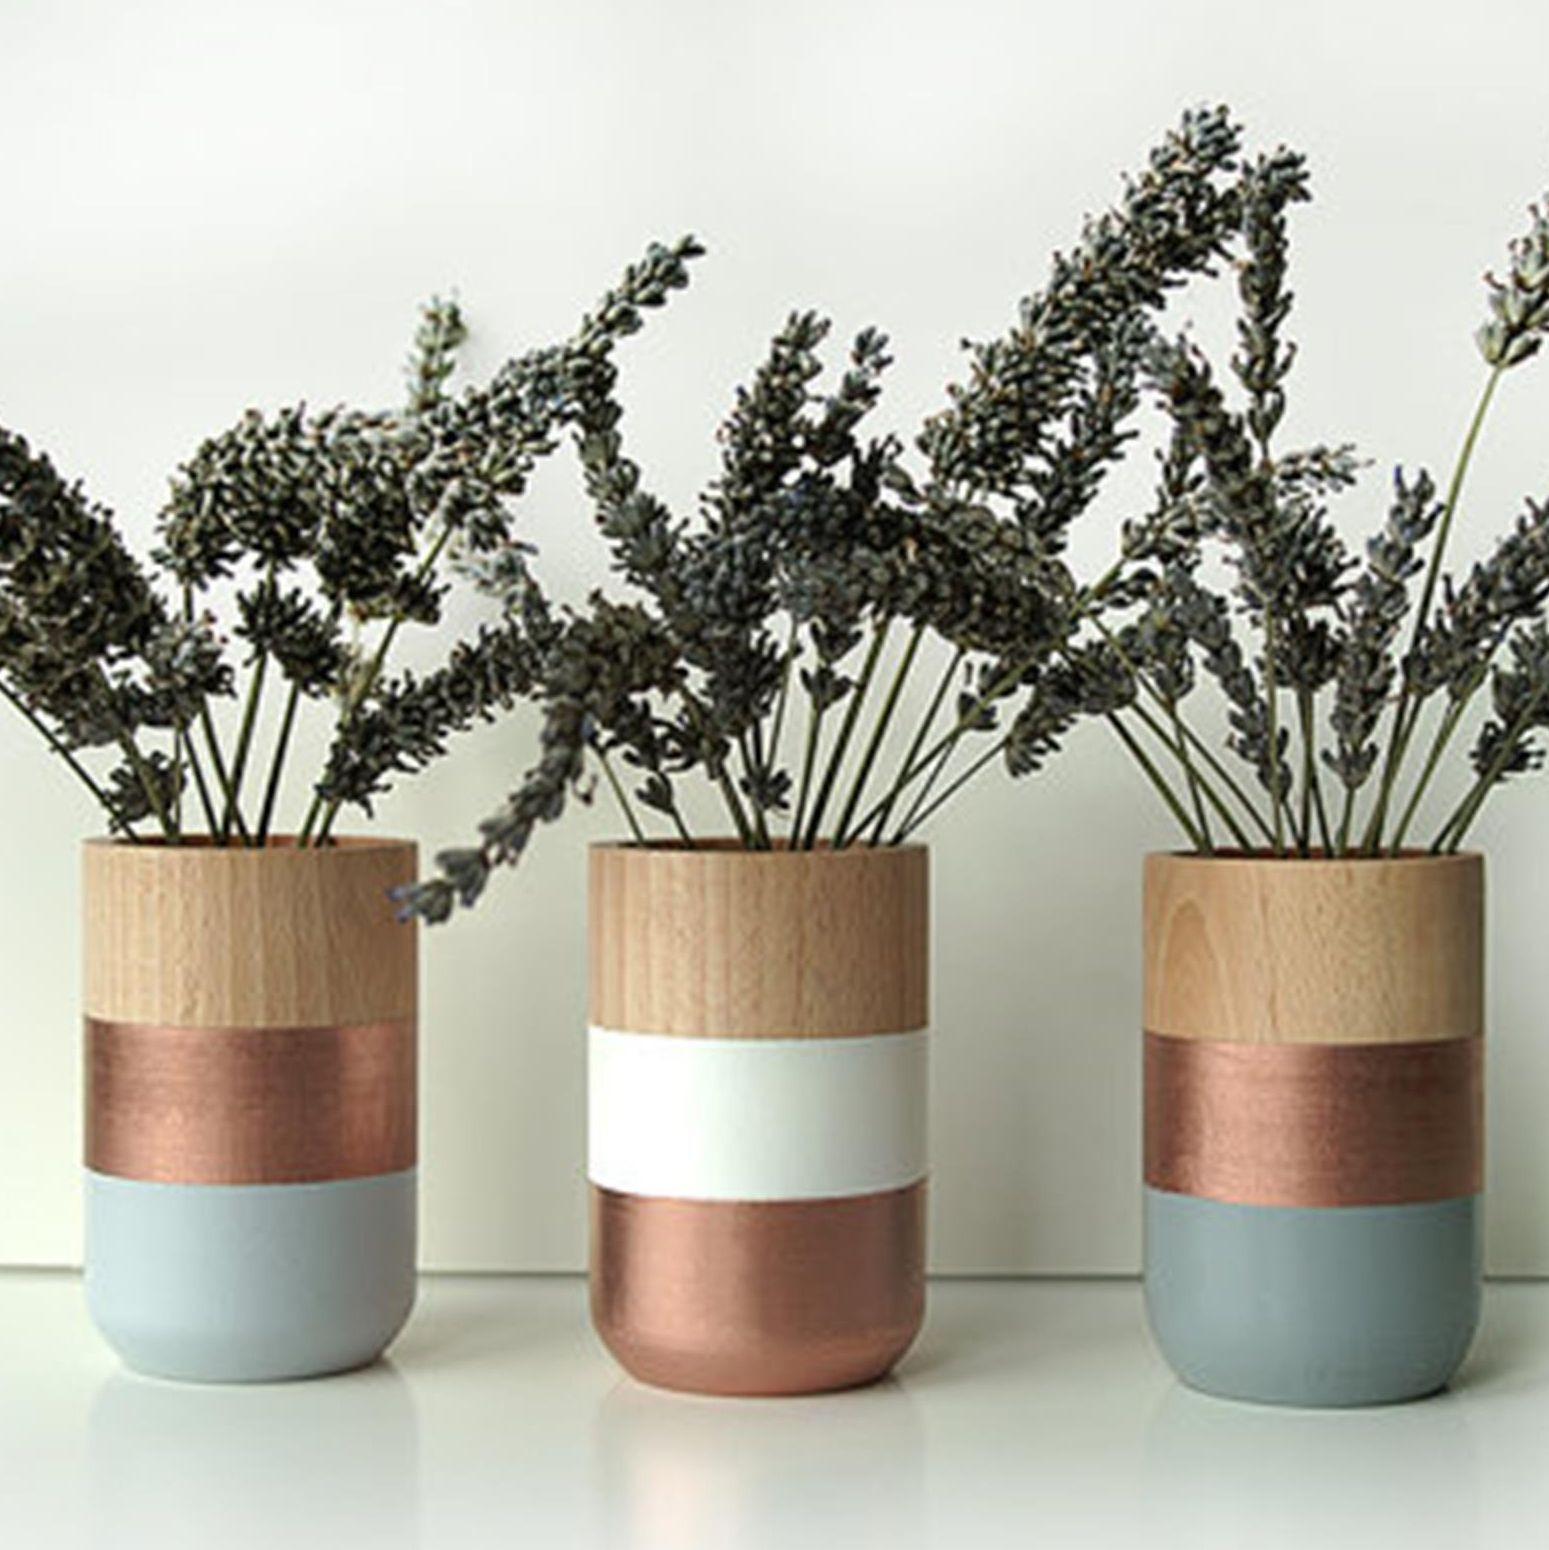 28 Spectacular Set Of 3 Large Vases 2021 free download set of 3 large vases of hardtofind small vases in metallic bronze set of 3 items in small vases in metallic bronze set of 3